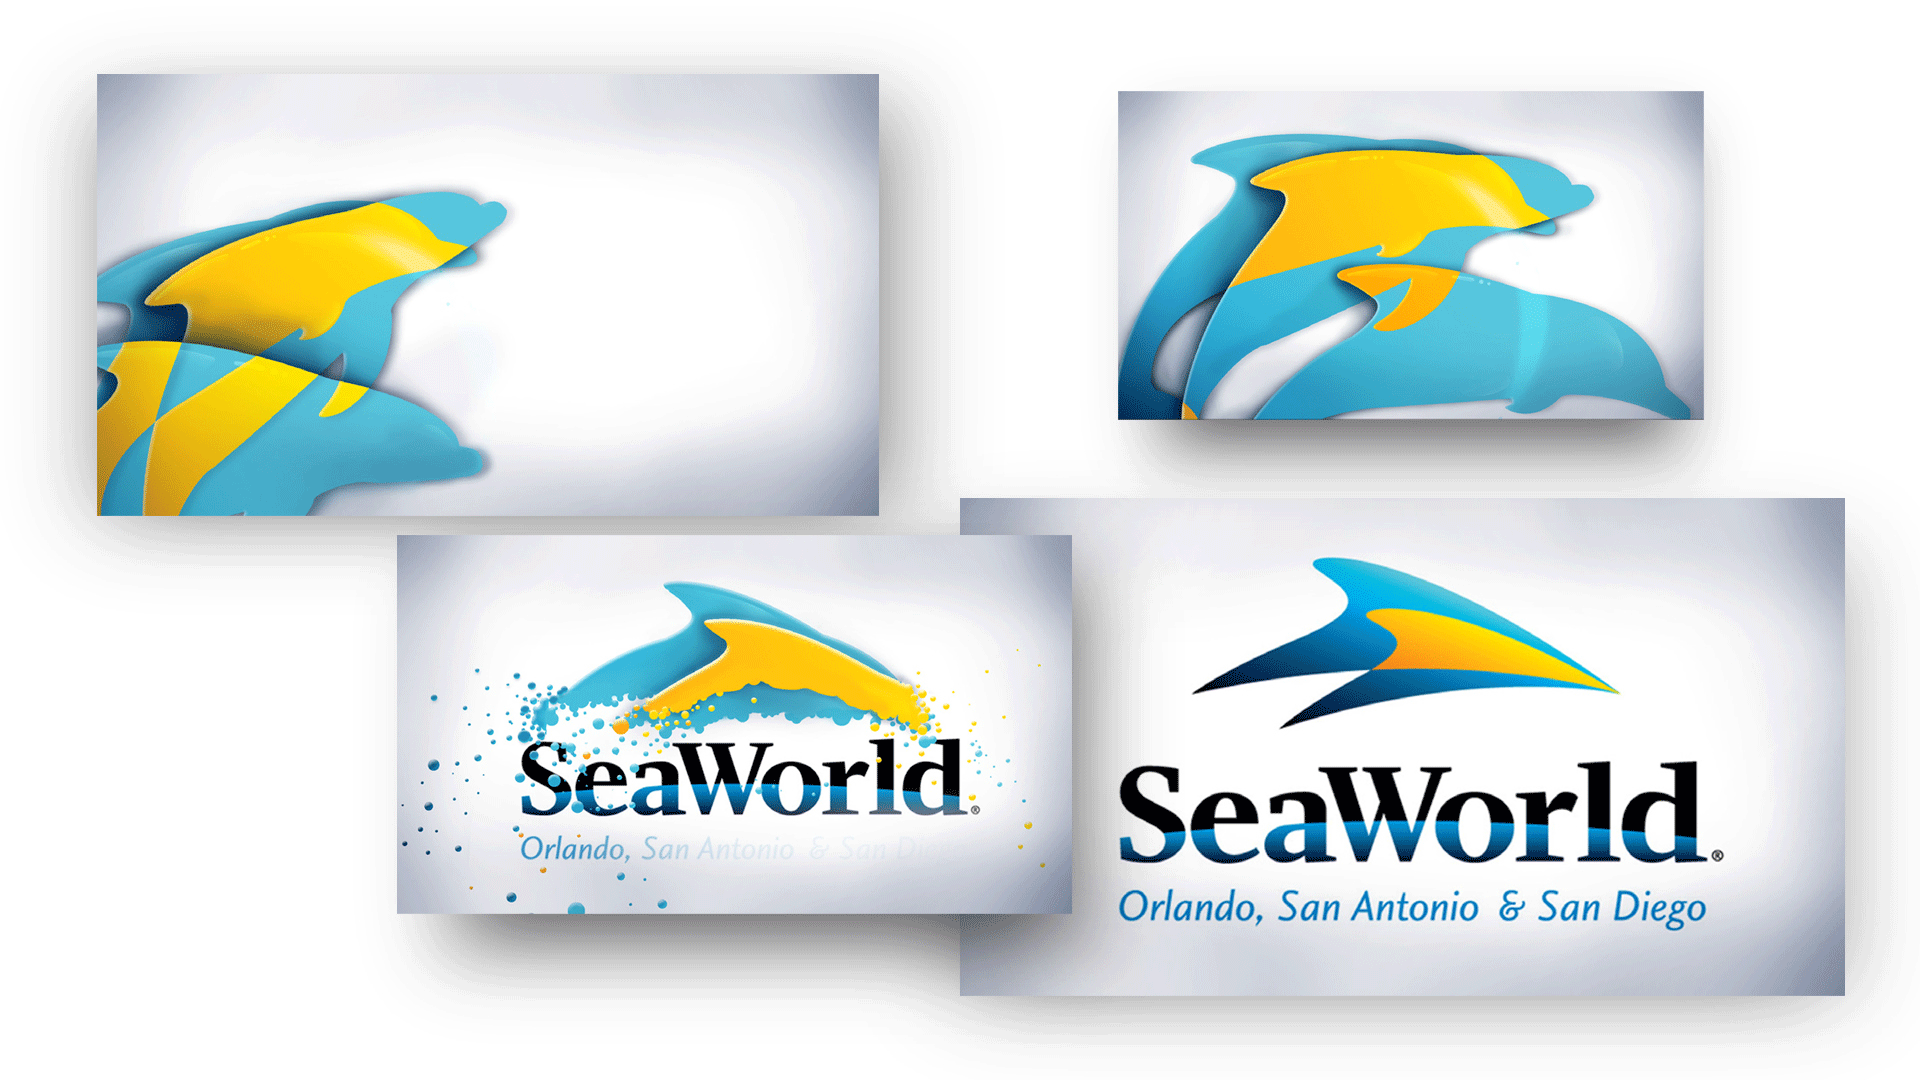 Seaworld Logo Animation